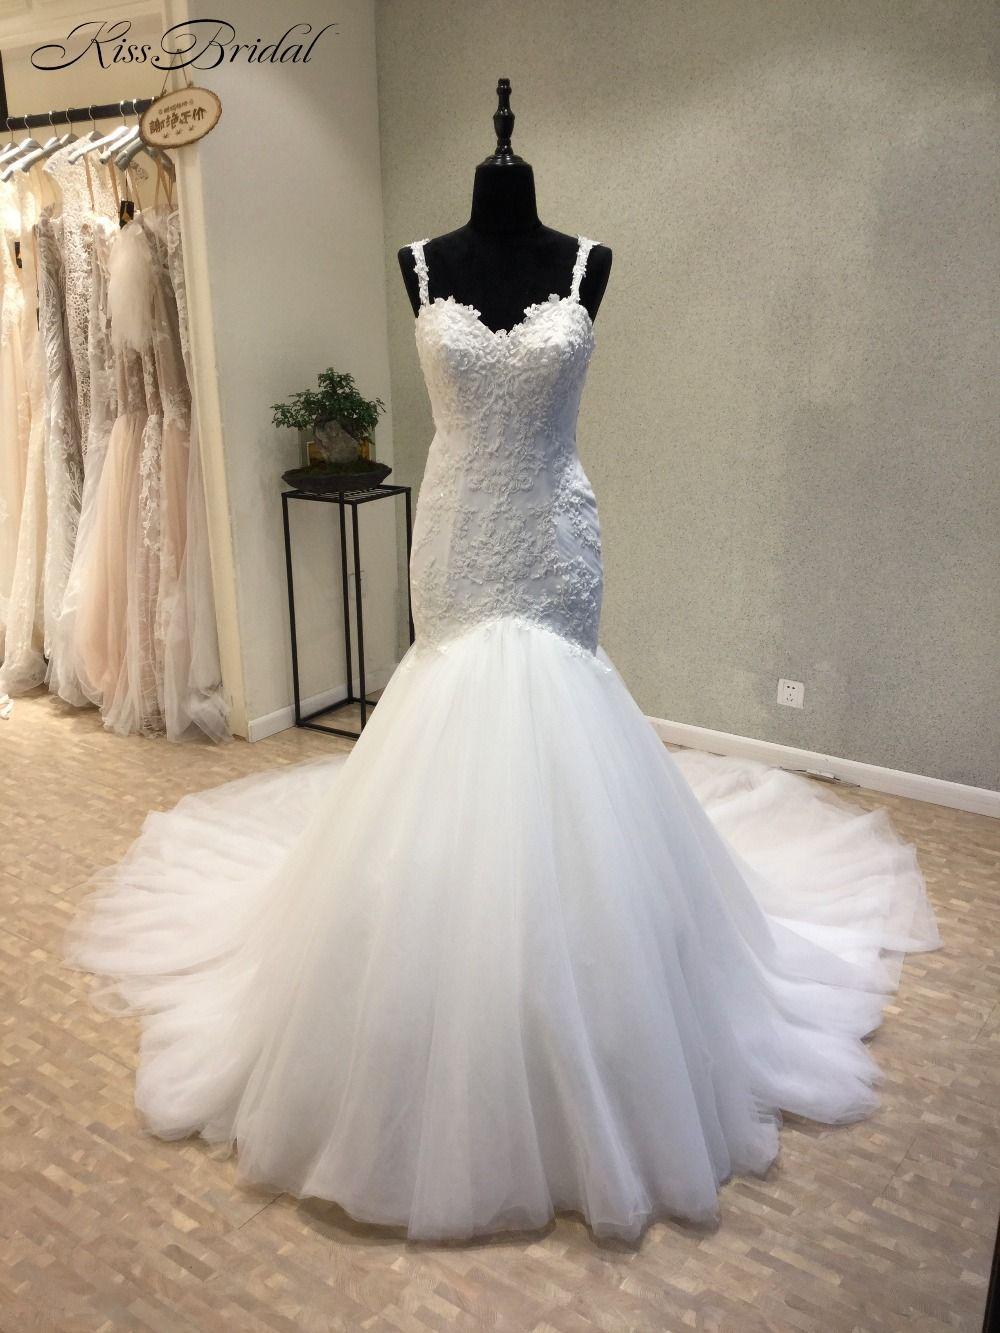 Find More Wedding Dresses Information about Corset Back